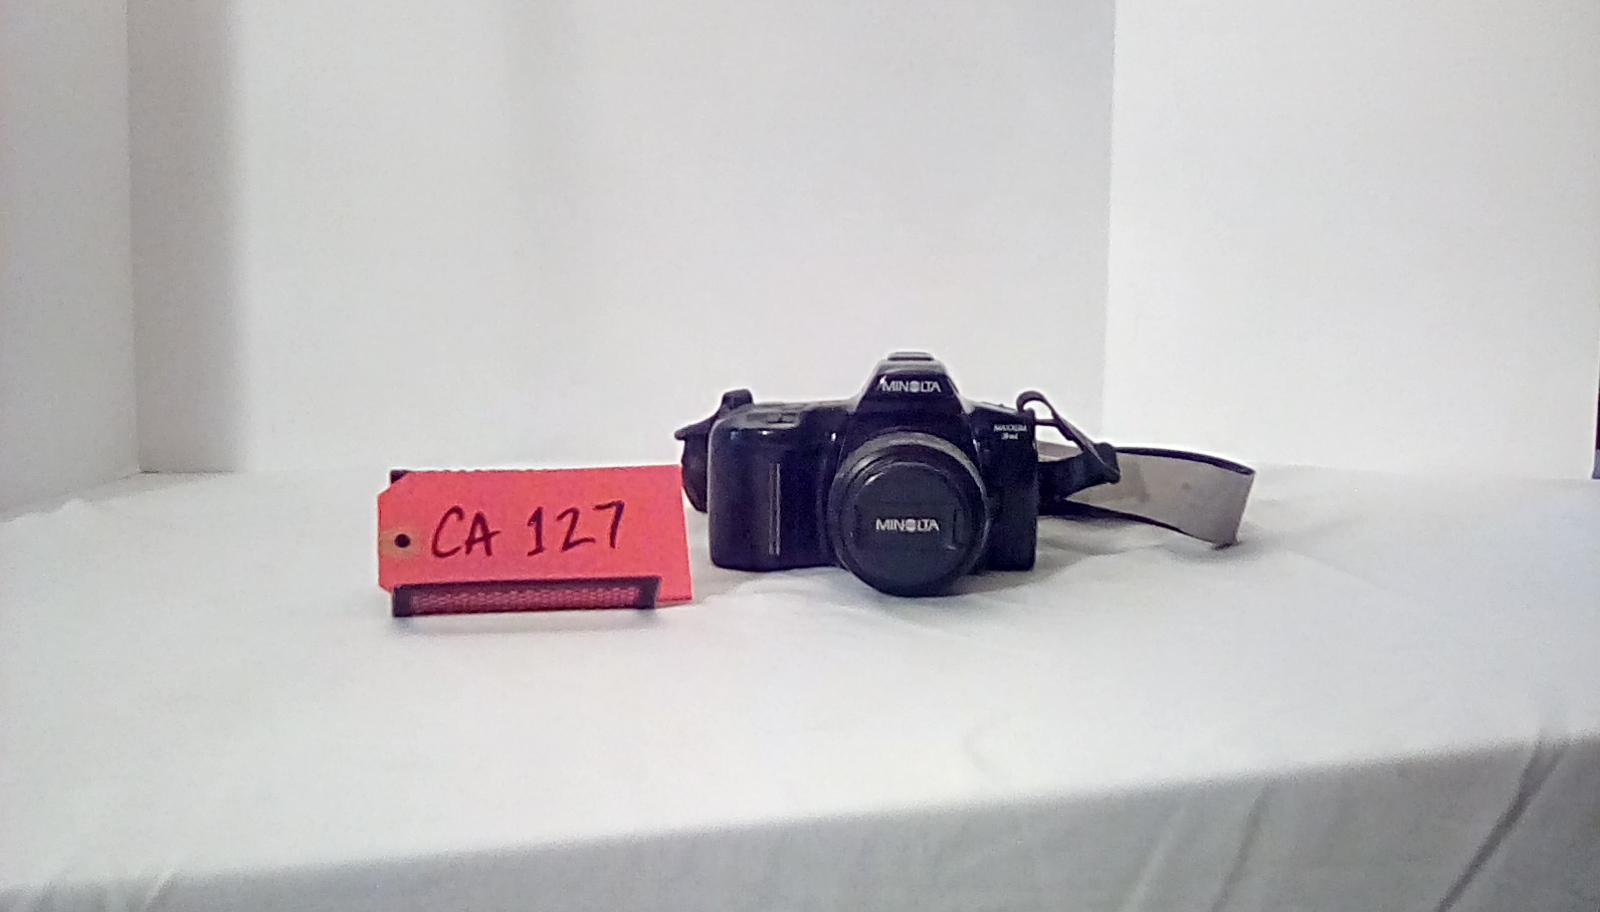 CA127, minolta maxxum 3xi, , 35mm SLR Film Camera is an autofocus 35mm single-lens reflex , w/strap,